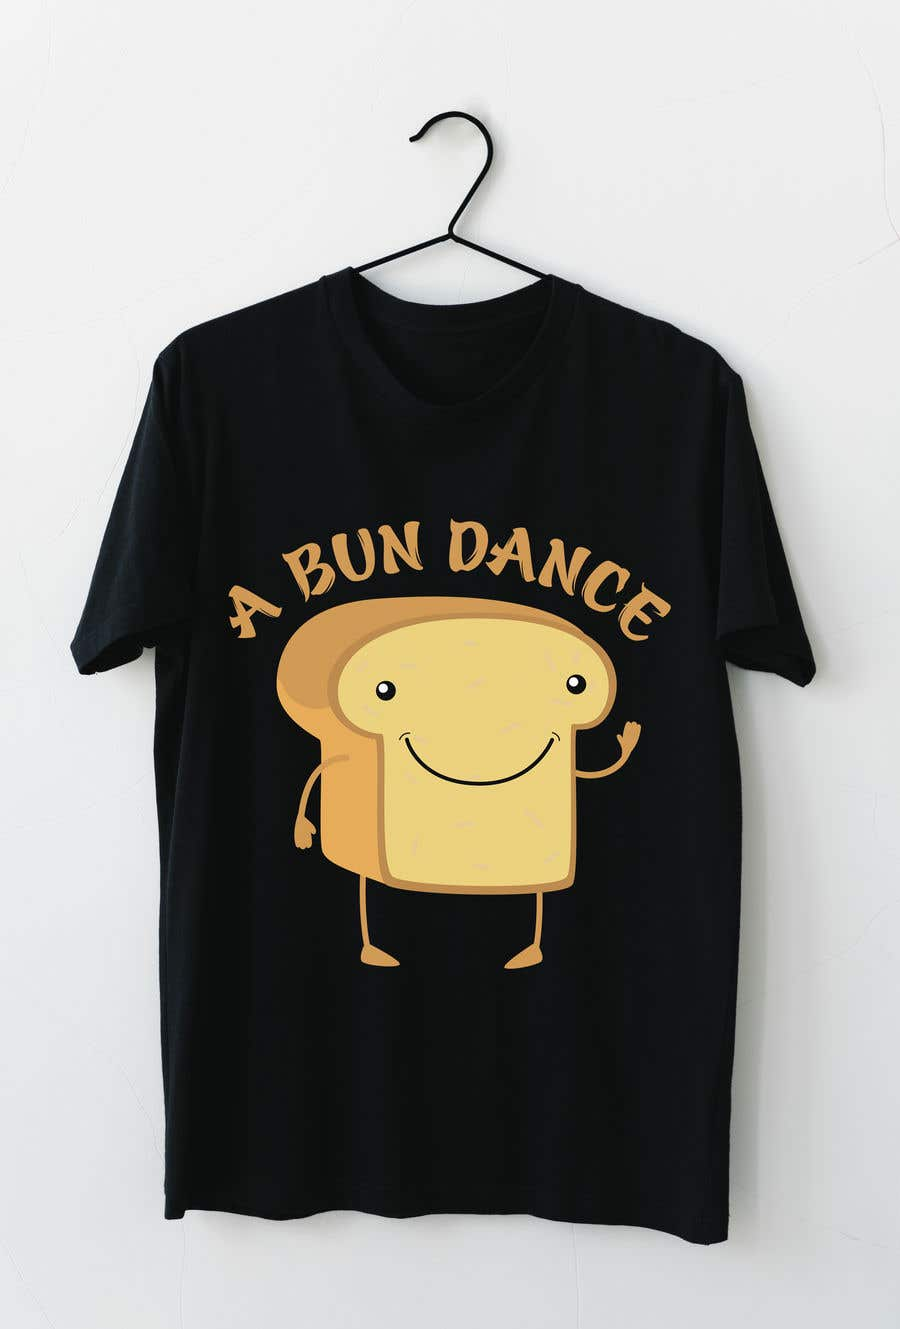 Bài tham dự cuộc thi #                                        13                                      cho                                         A Bun Dance Graphic Design T-Shirt